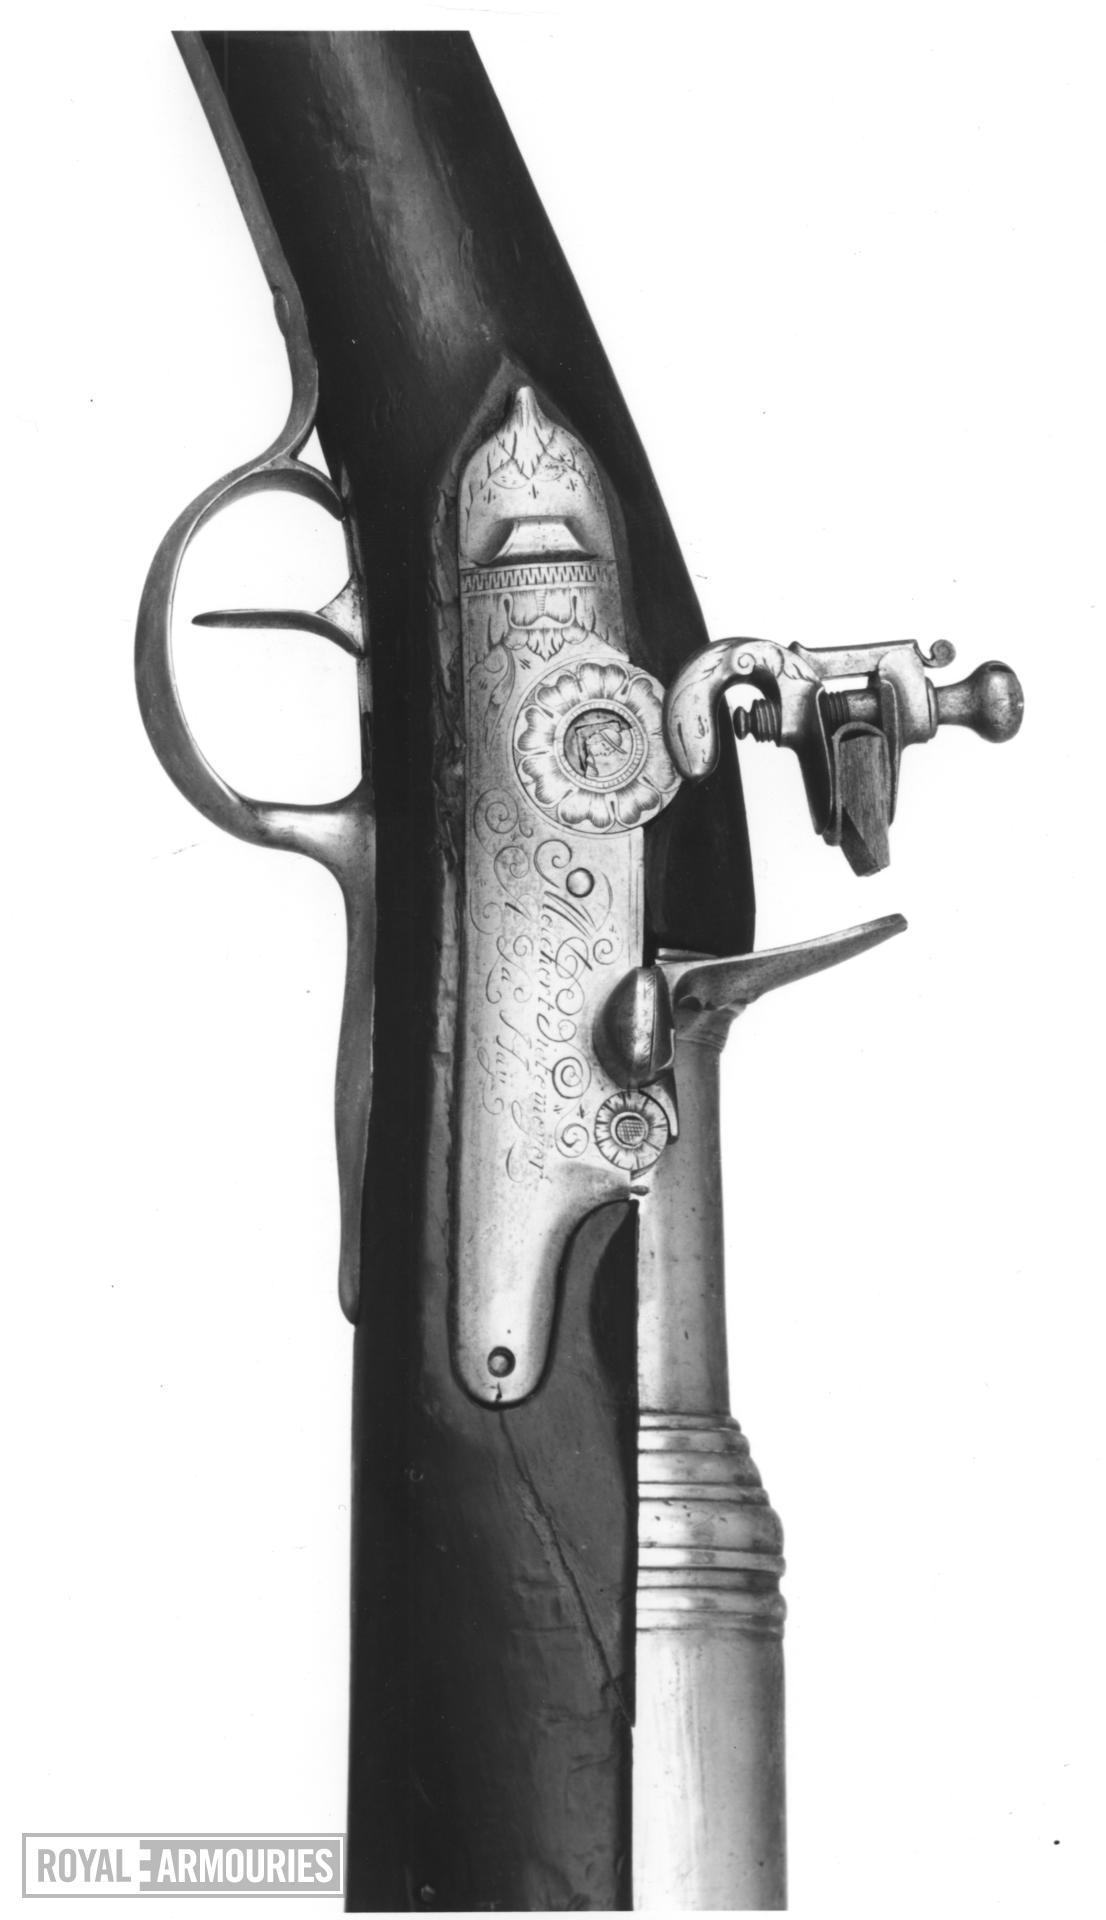 Flintlock musketoon - By Melchert Dietmeyer